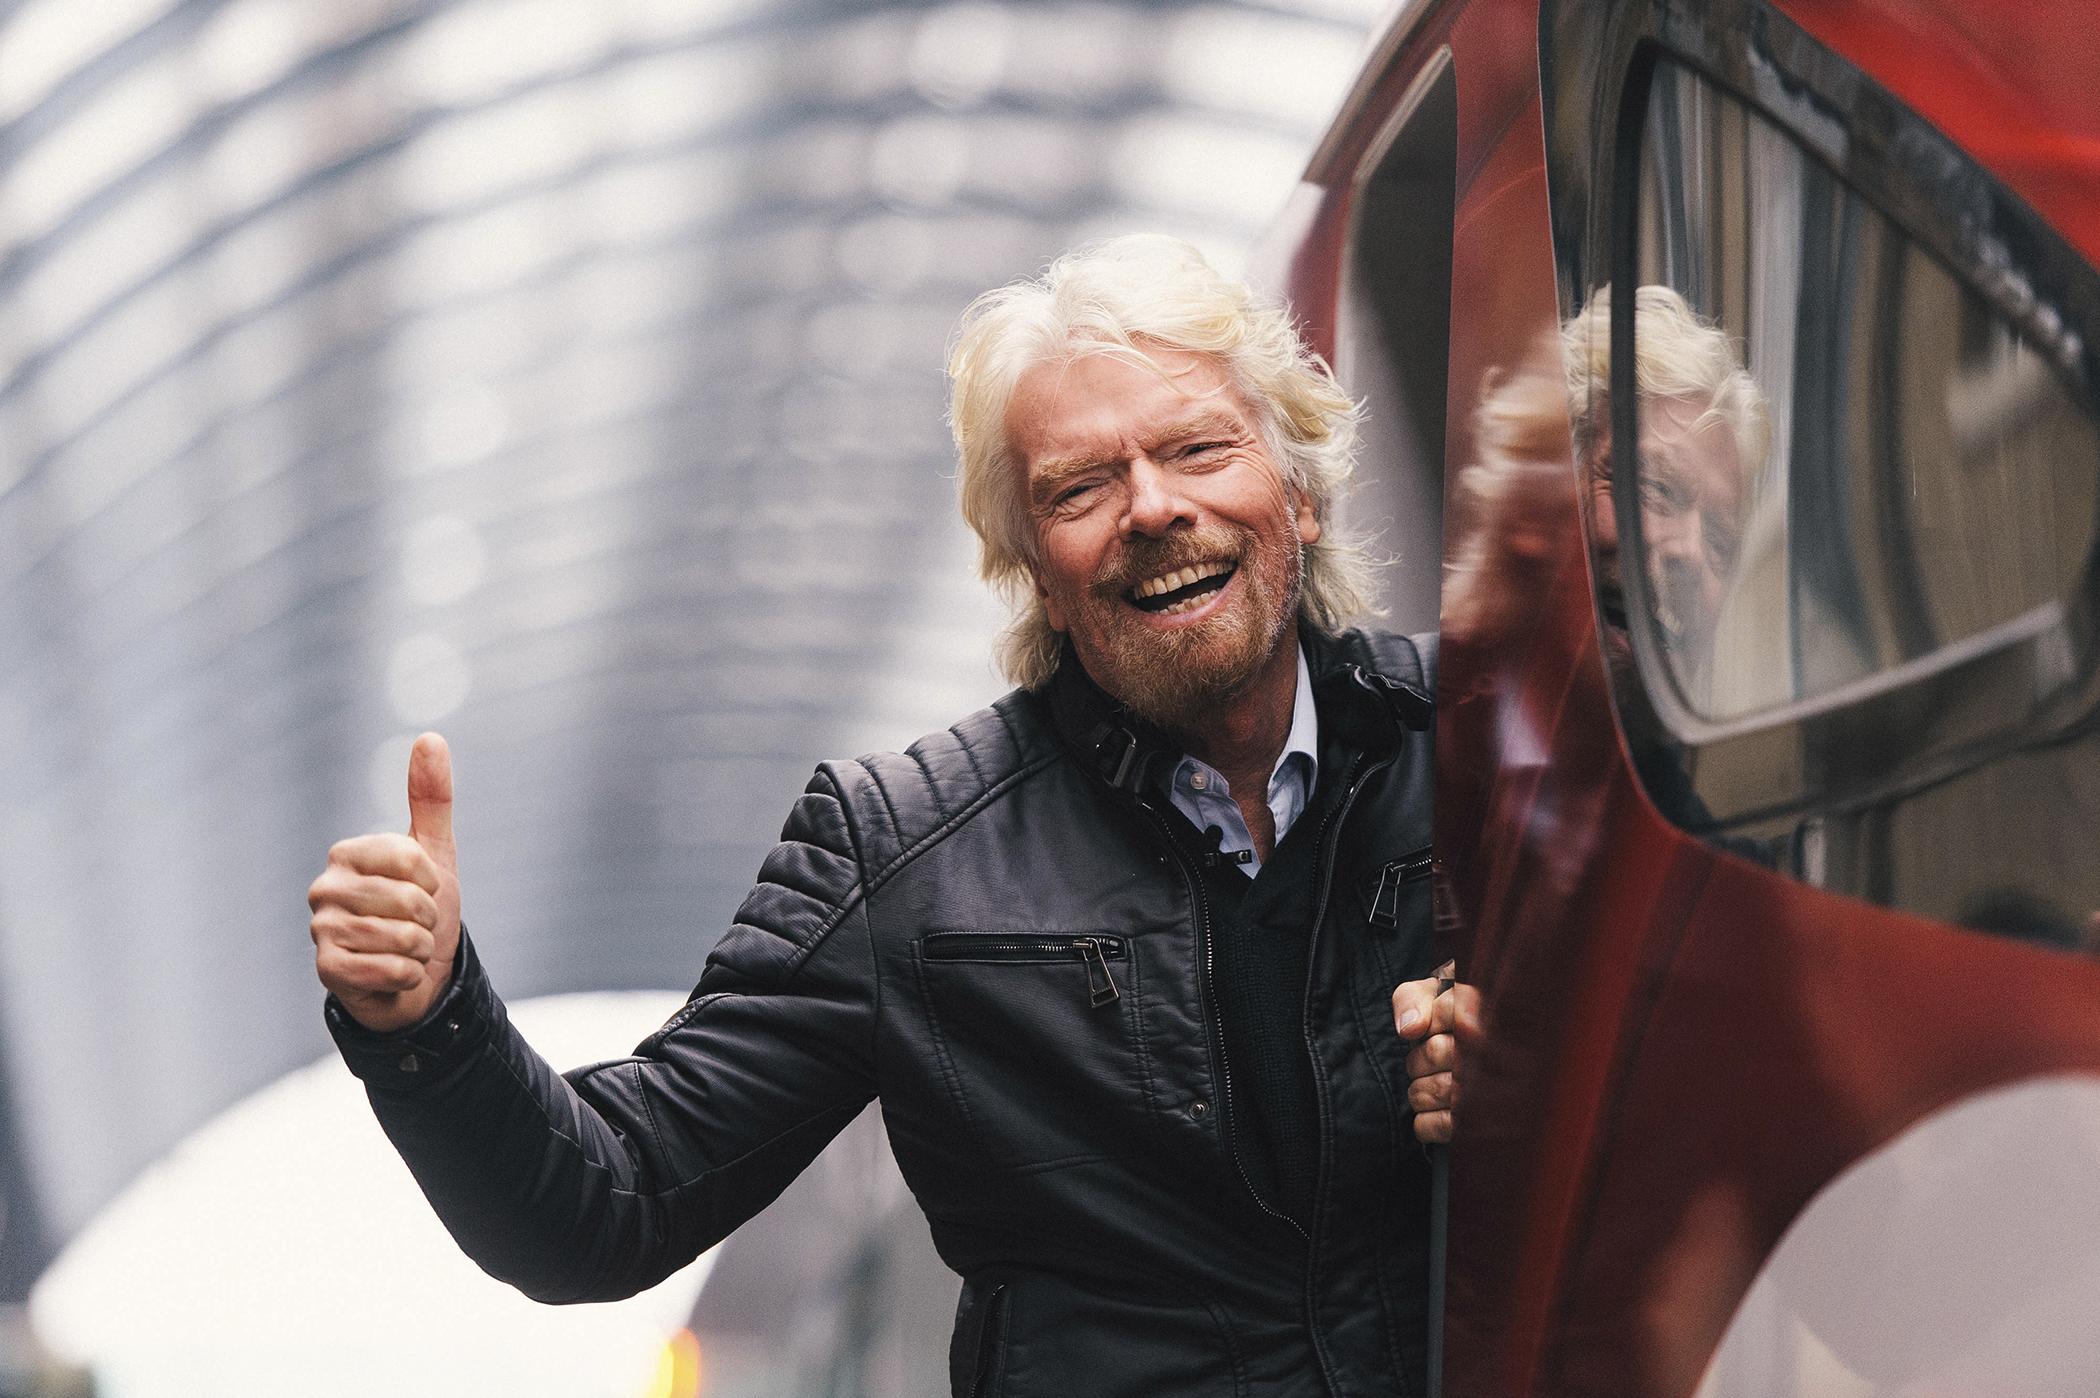 Sir Richard Branson unveils the new Virgin Azuma train, Kings Cross Station, London, March 18, 2016.